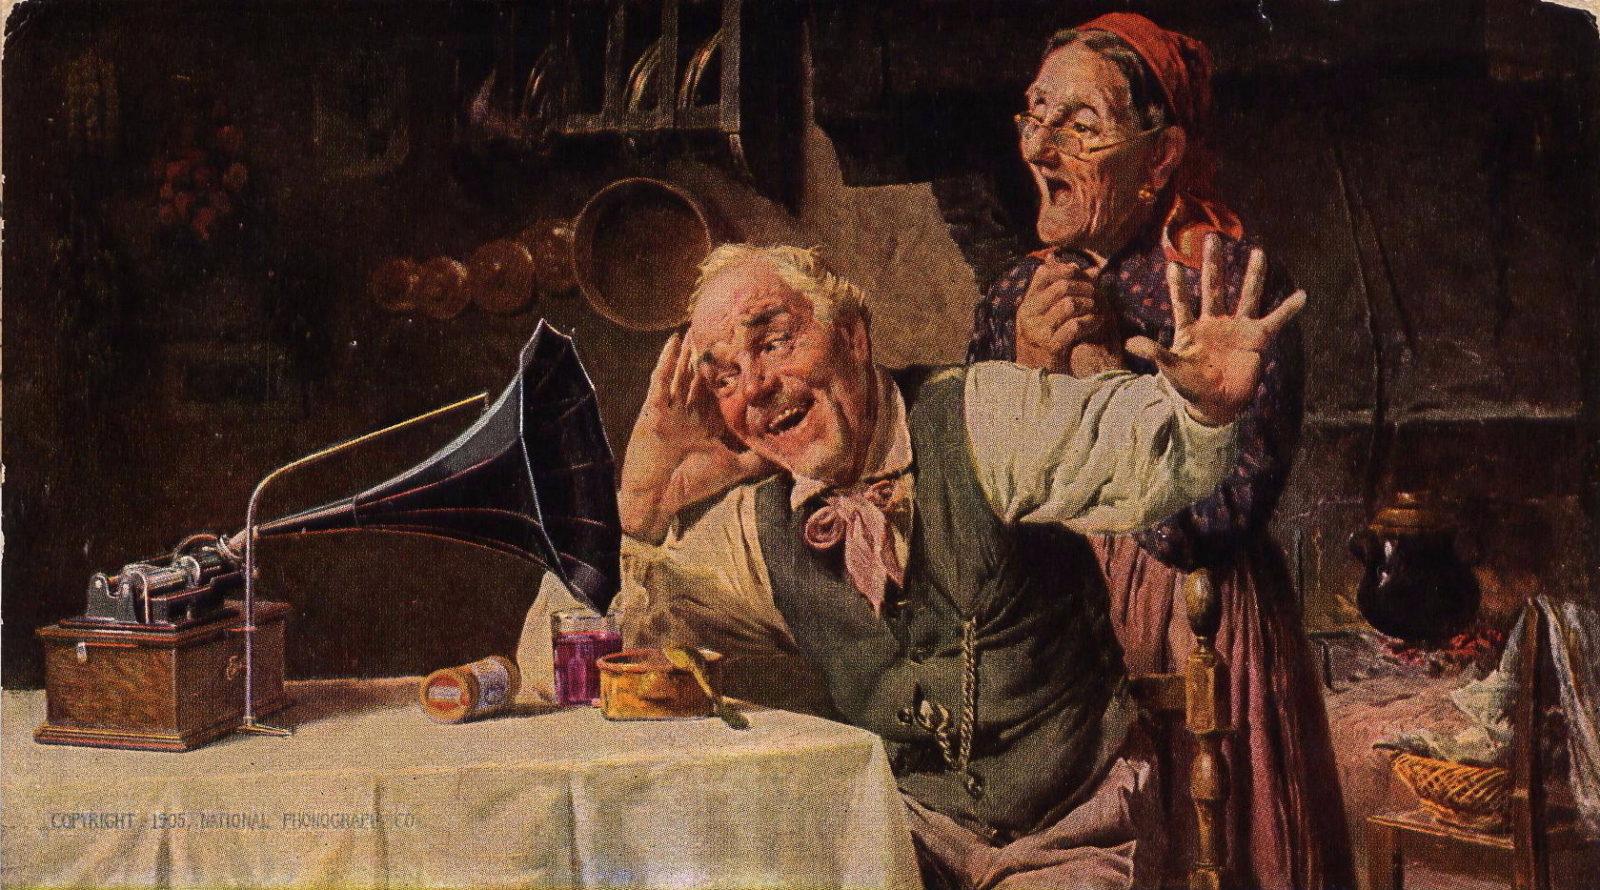 edisondelights1905_wahrnemung_Wahrnehmung-The Edison Phonograph Wikimedia commons